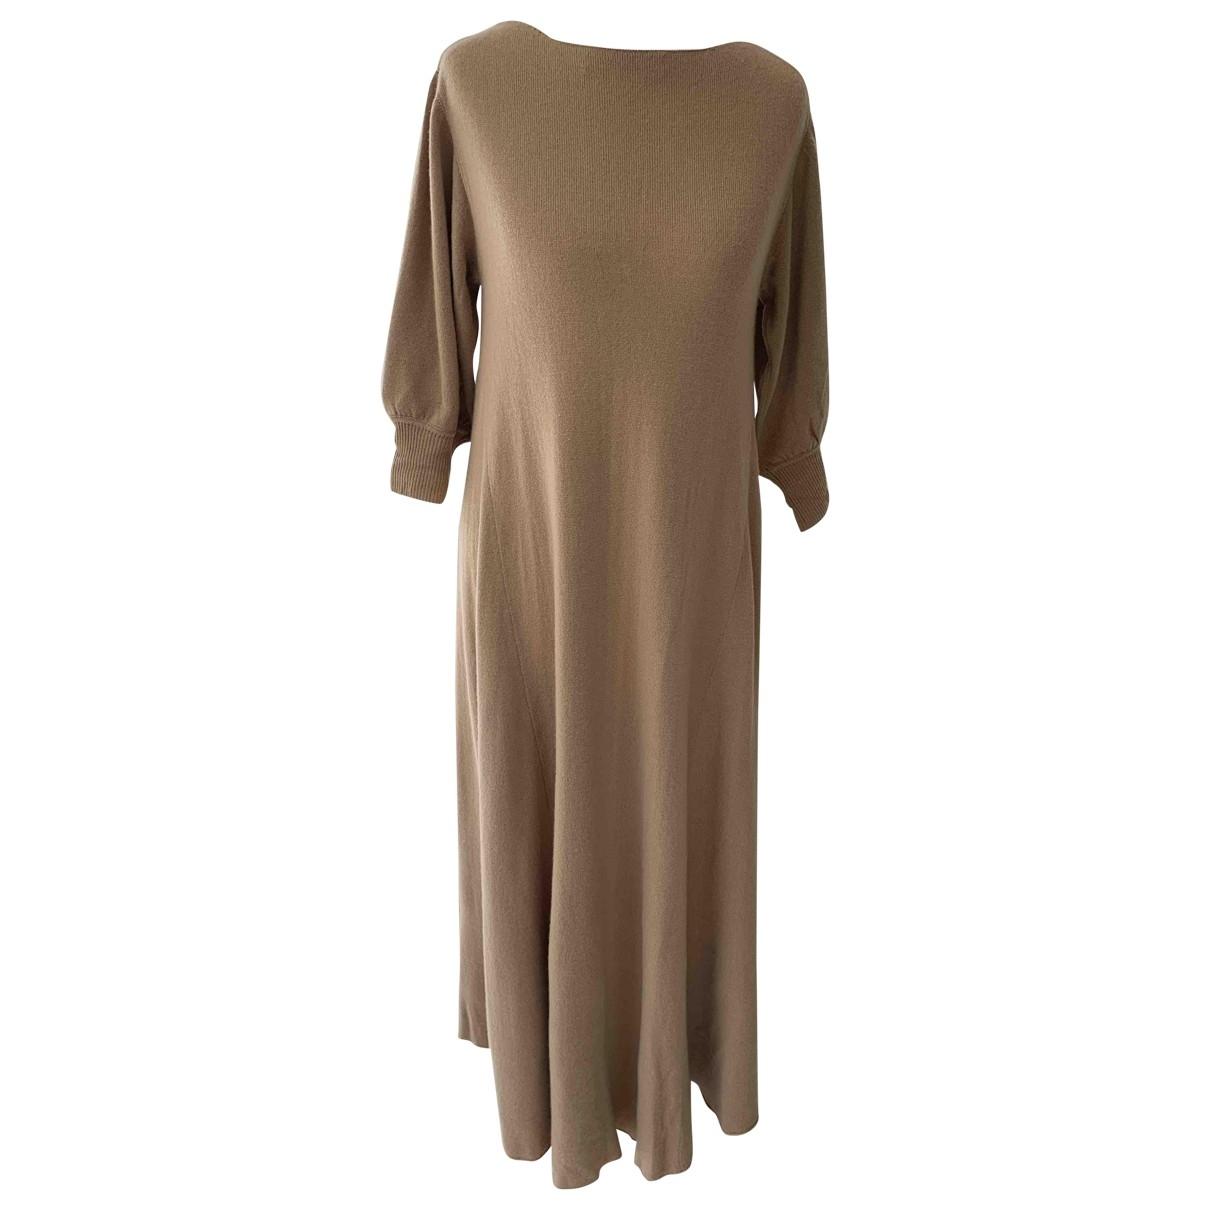 Ryan Roche \N Beige Cashmere dress for Women S International